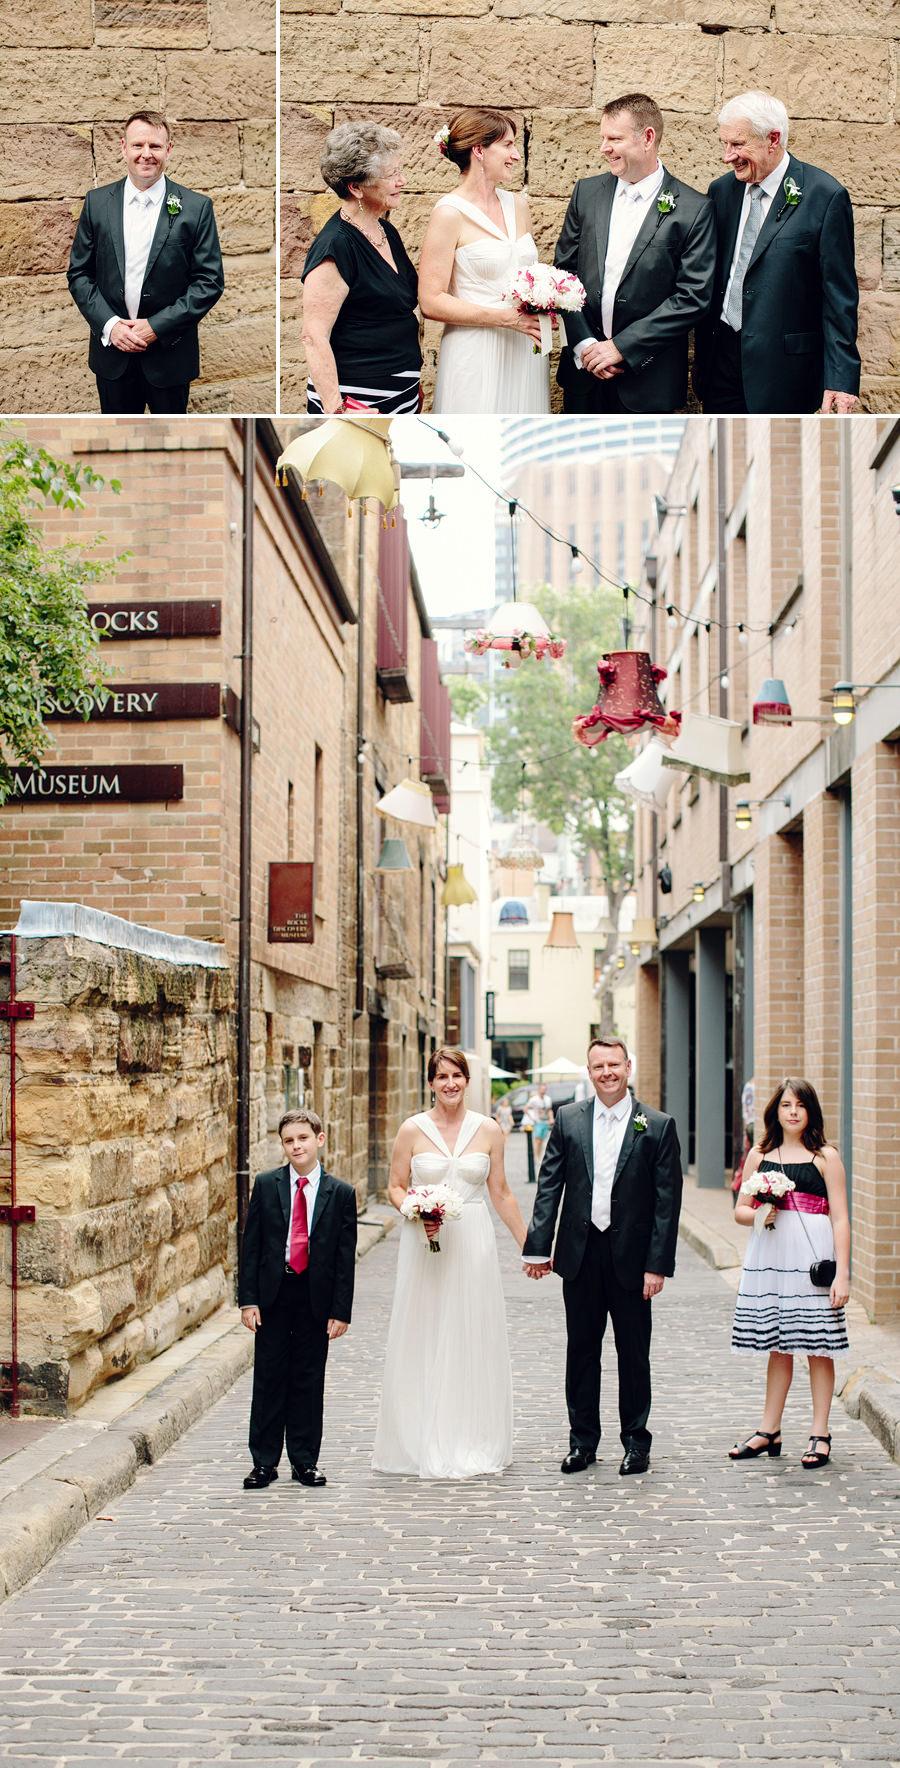 The Rocks Wedding Photographer: Bridal party